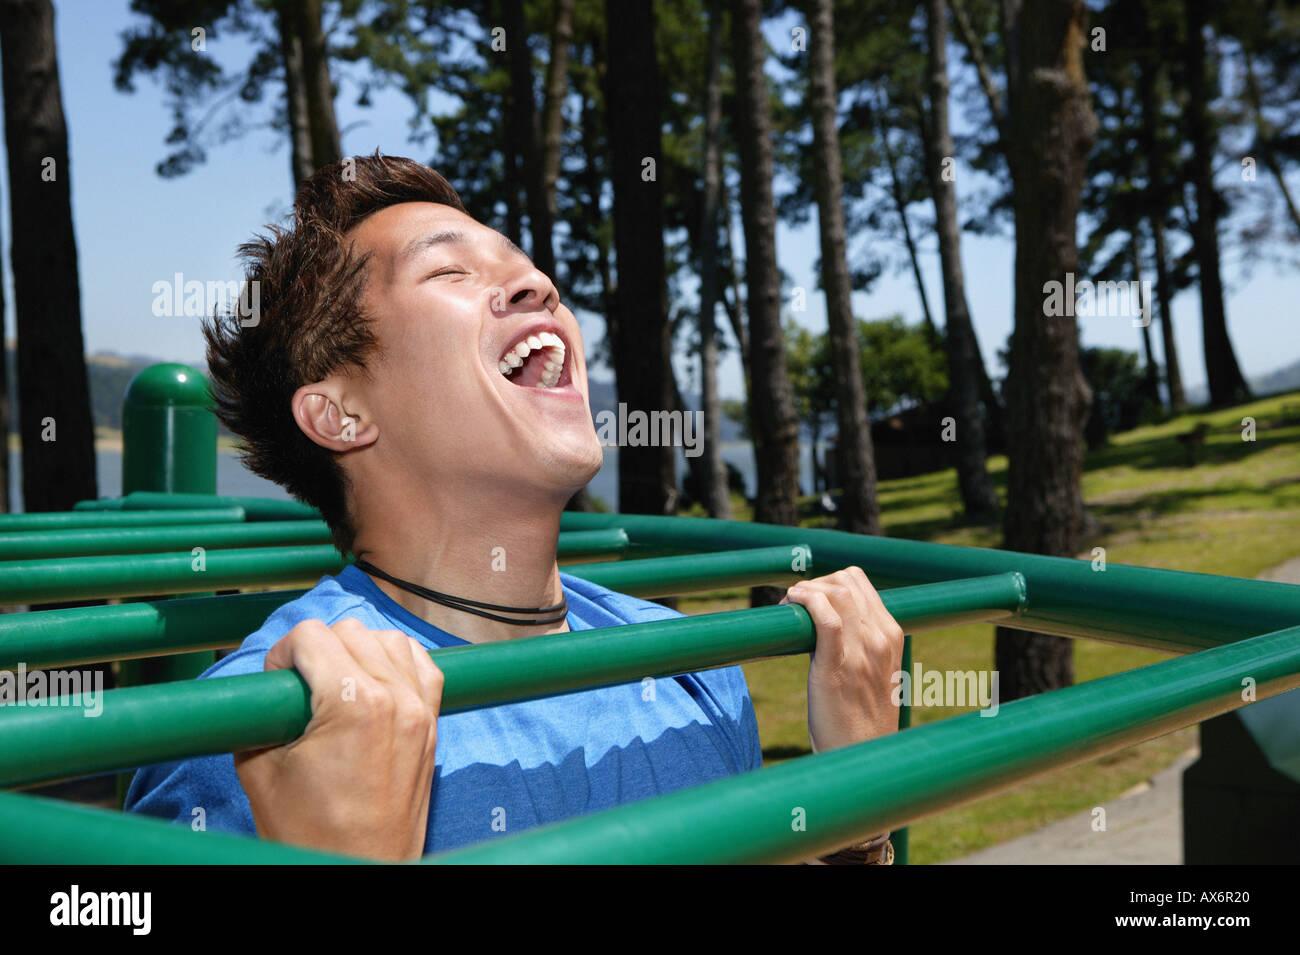 Young man on monkey bars - Stock Image